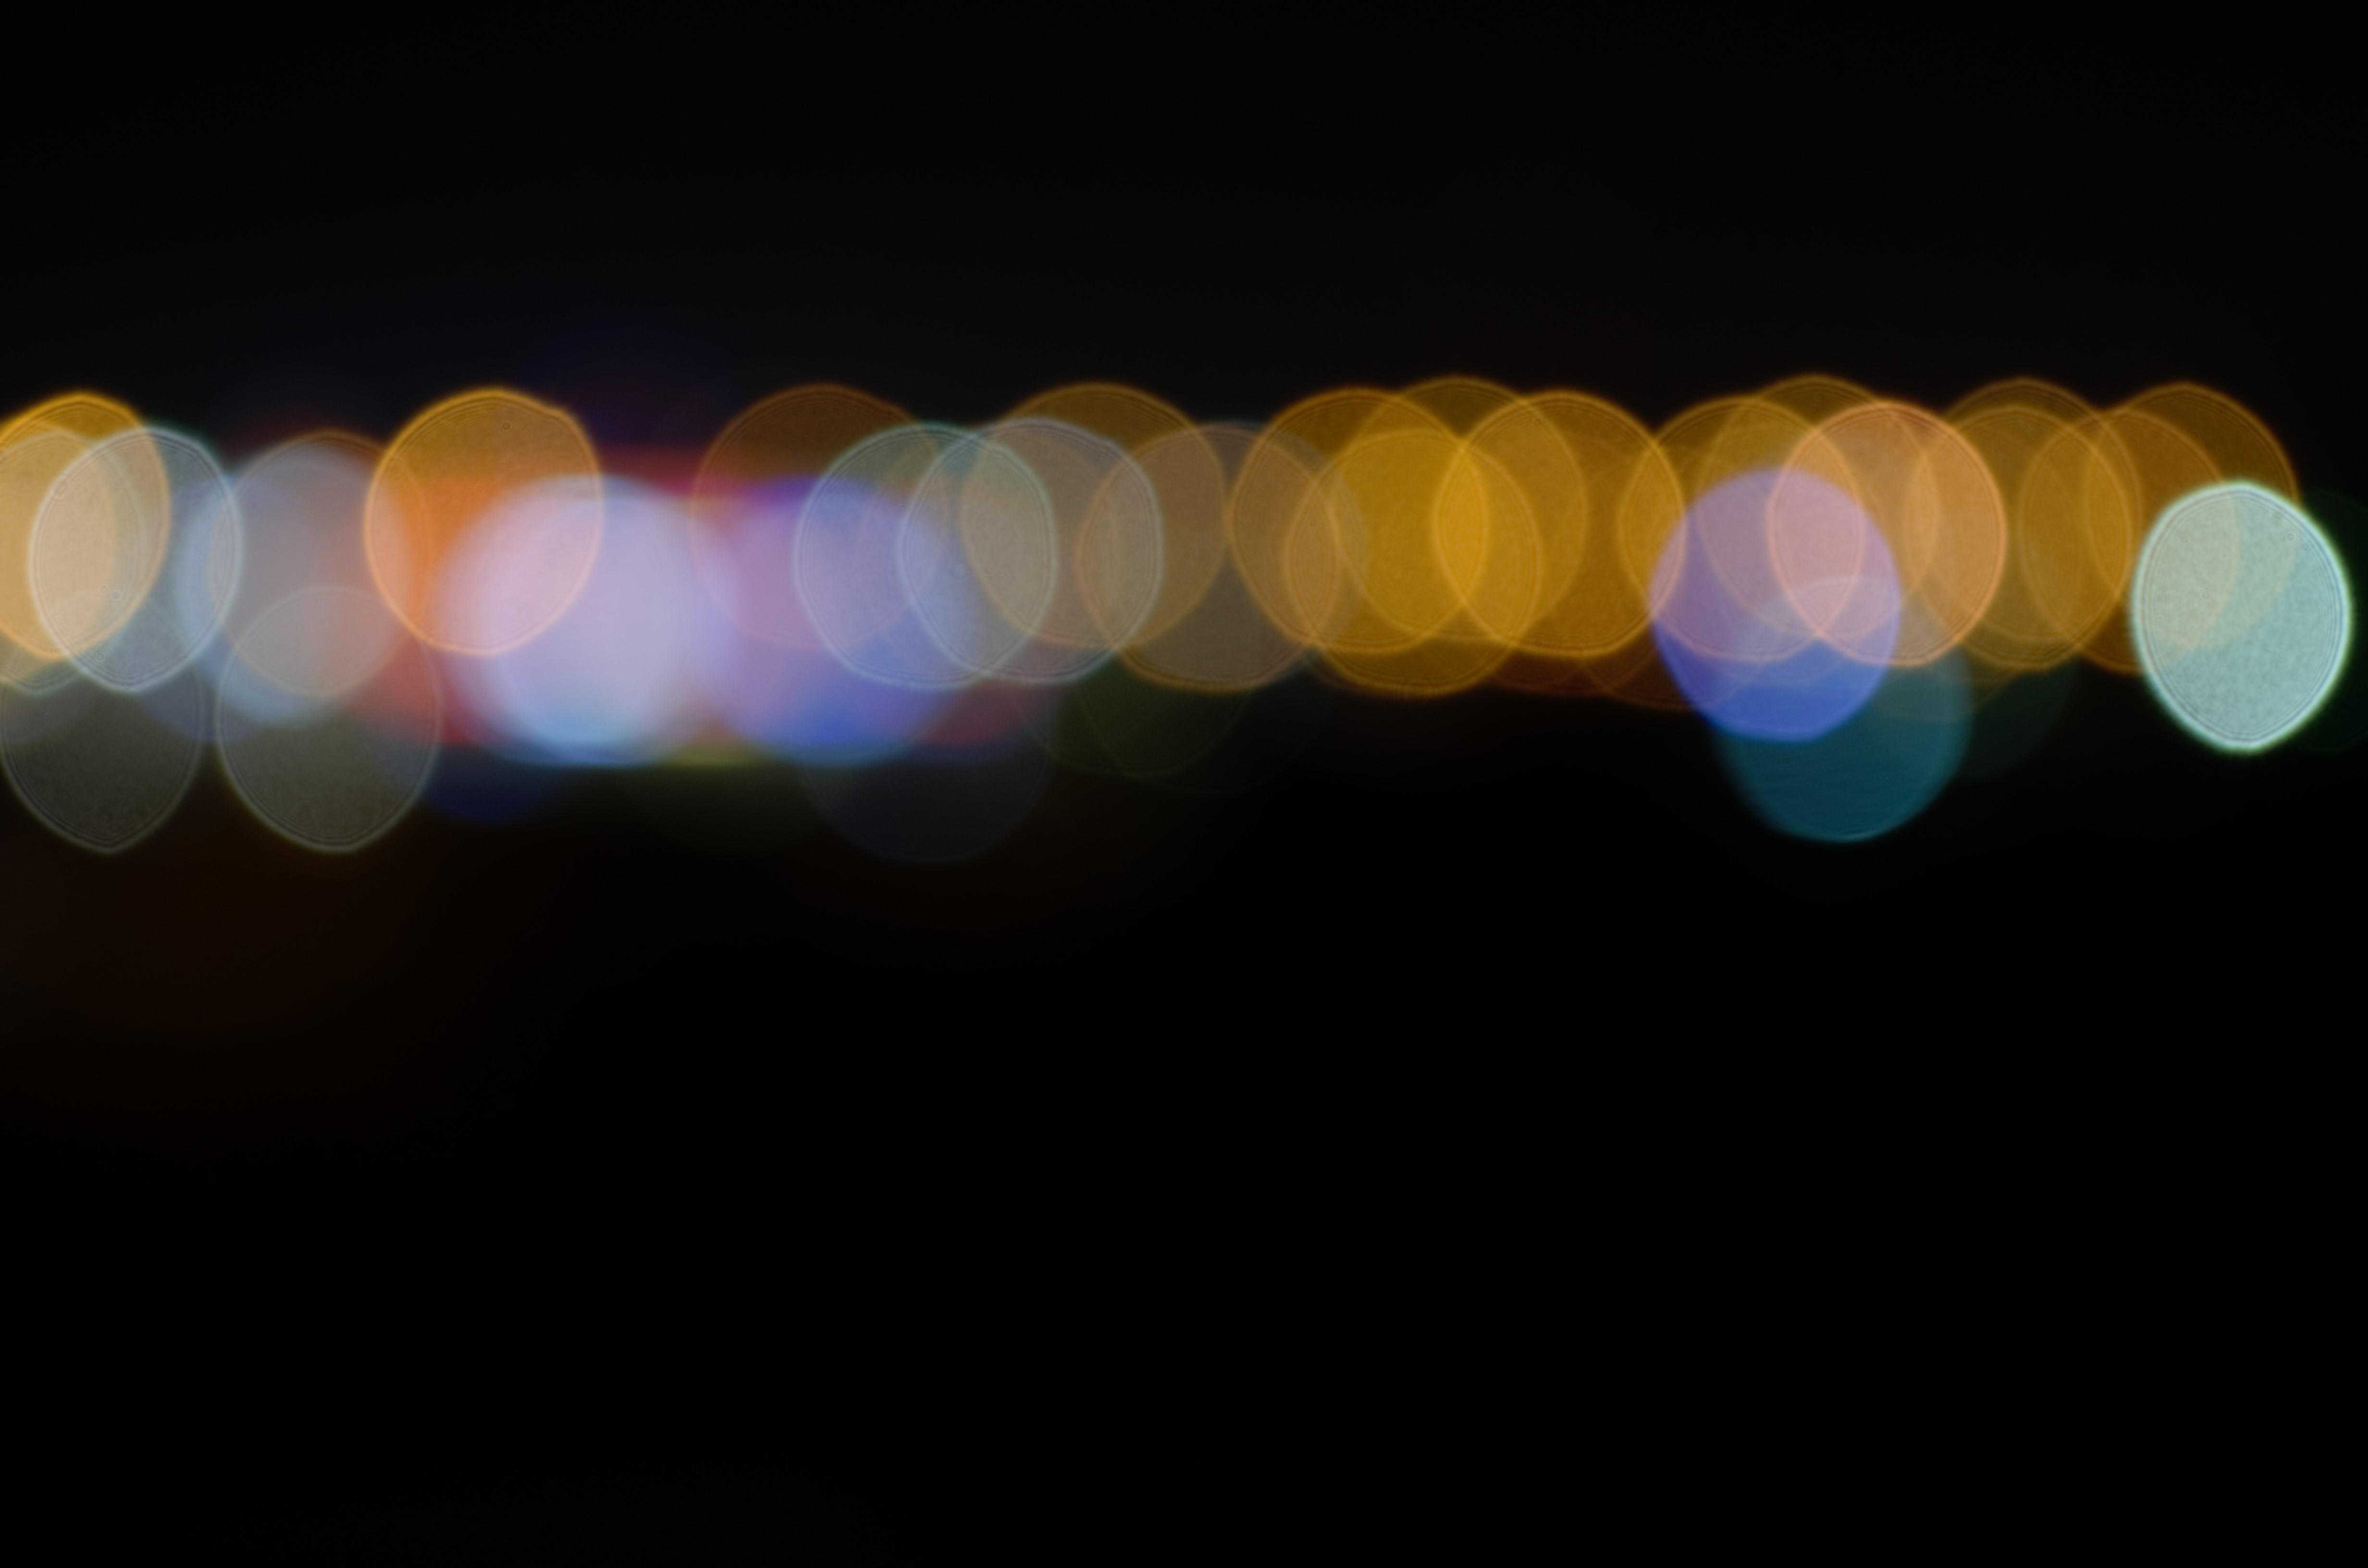 Car In Desert Hd Wallpaper Free Stock Photos Of Black Background 183 Pexels